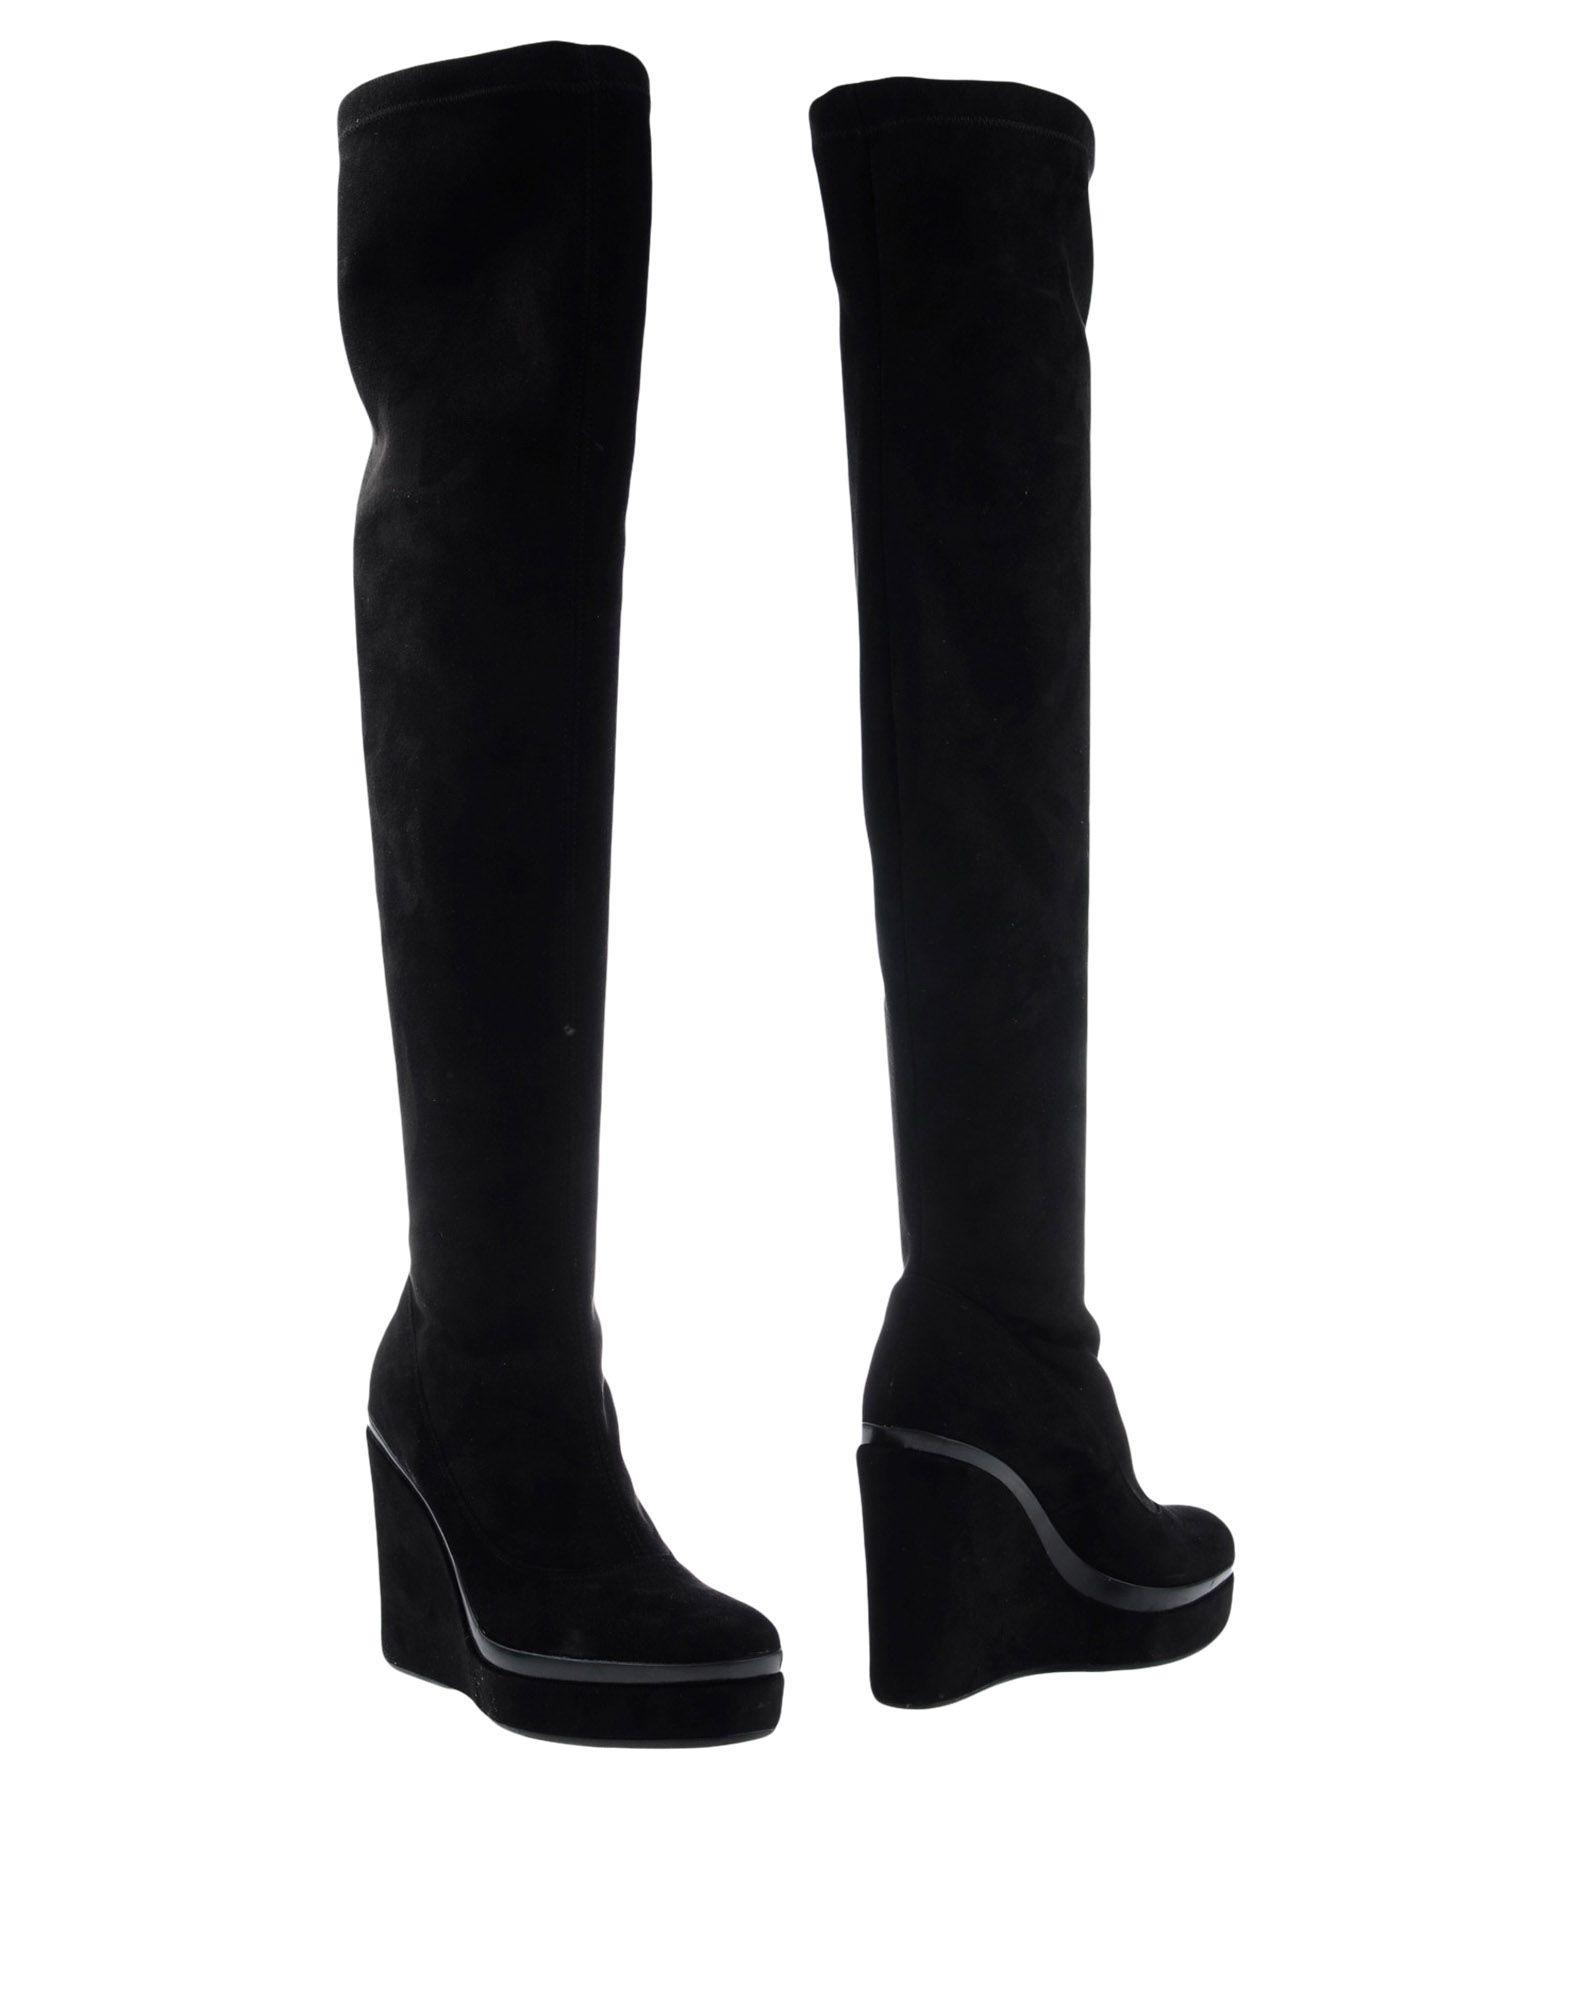 E Vee Stiefel Damen    11270079NS Gute Qualität beliebte Schuhe 124c58